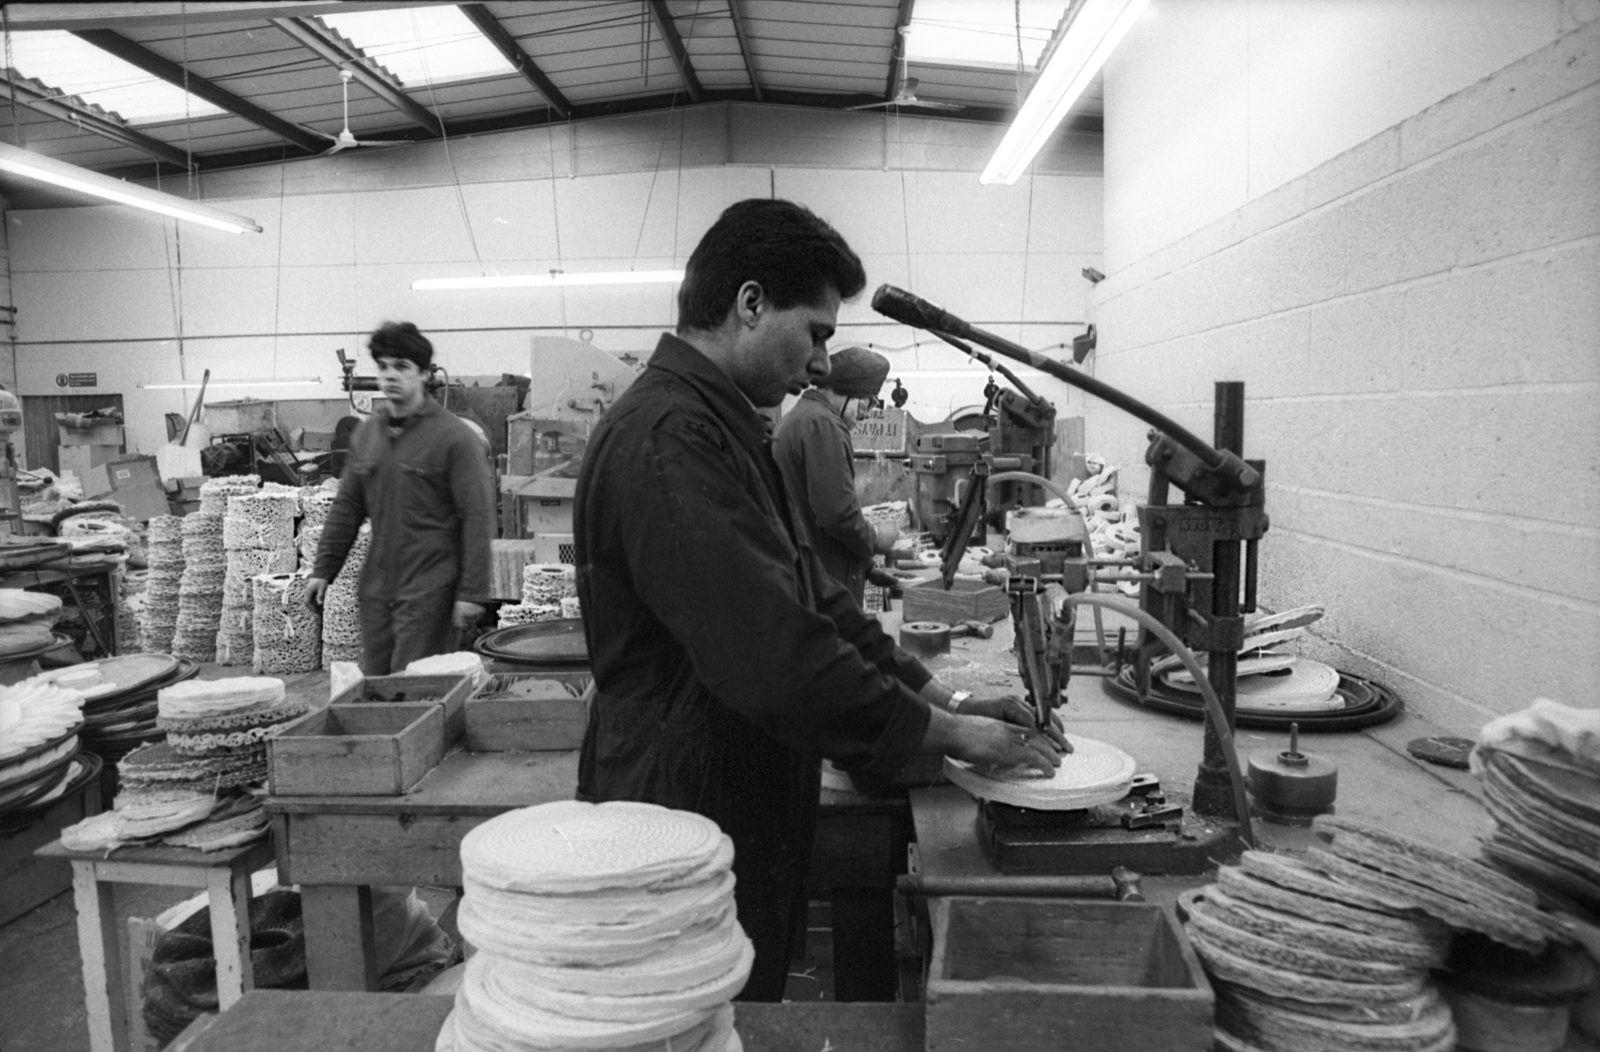 Punjabi worker